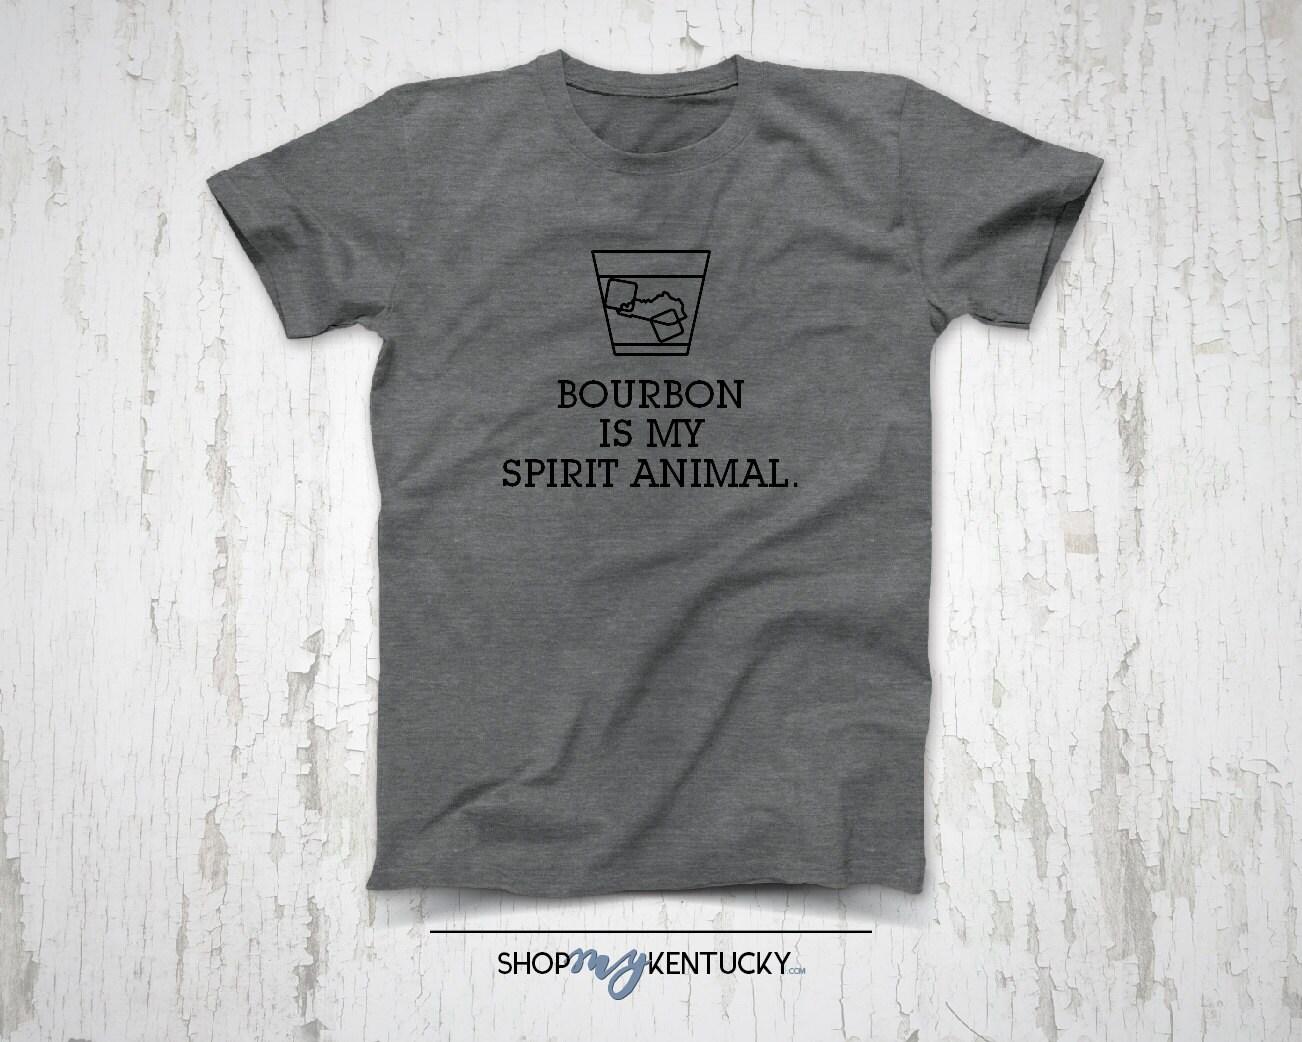 Design your own t shirt louisville ky - Bourbon Is My Spirit Animal T Shirt Kentucky Bluegrass State Whiskey Ky Bourbon Drink Alcohol Christmas Gift